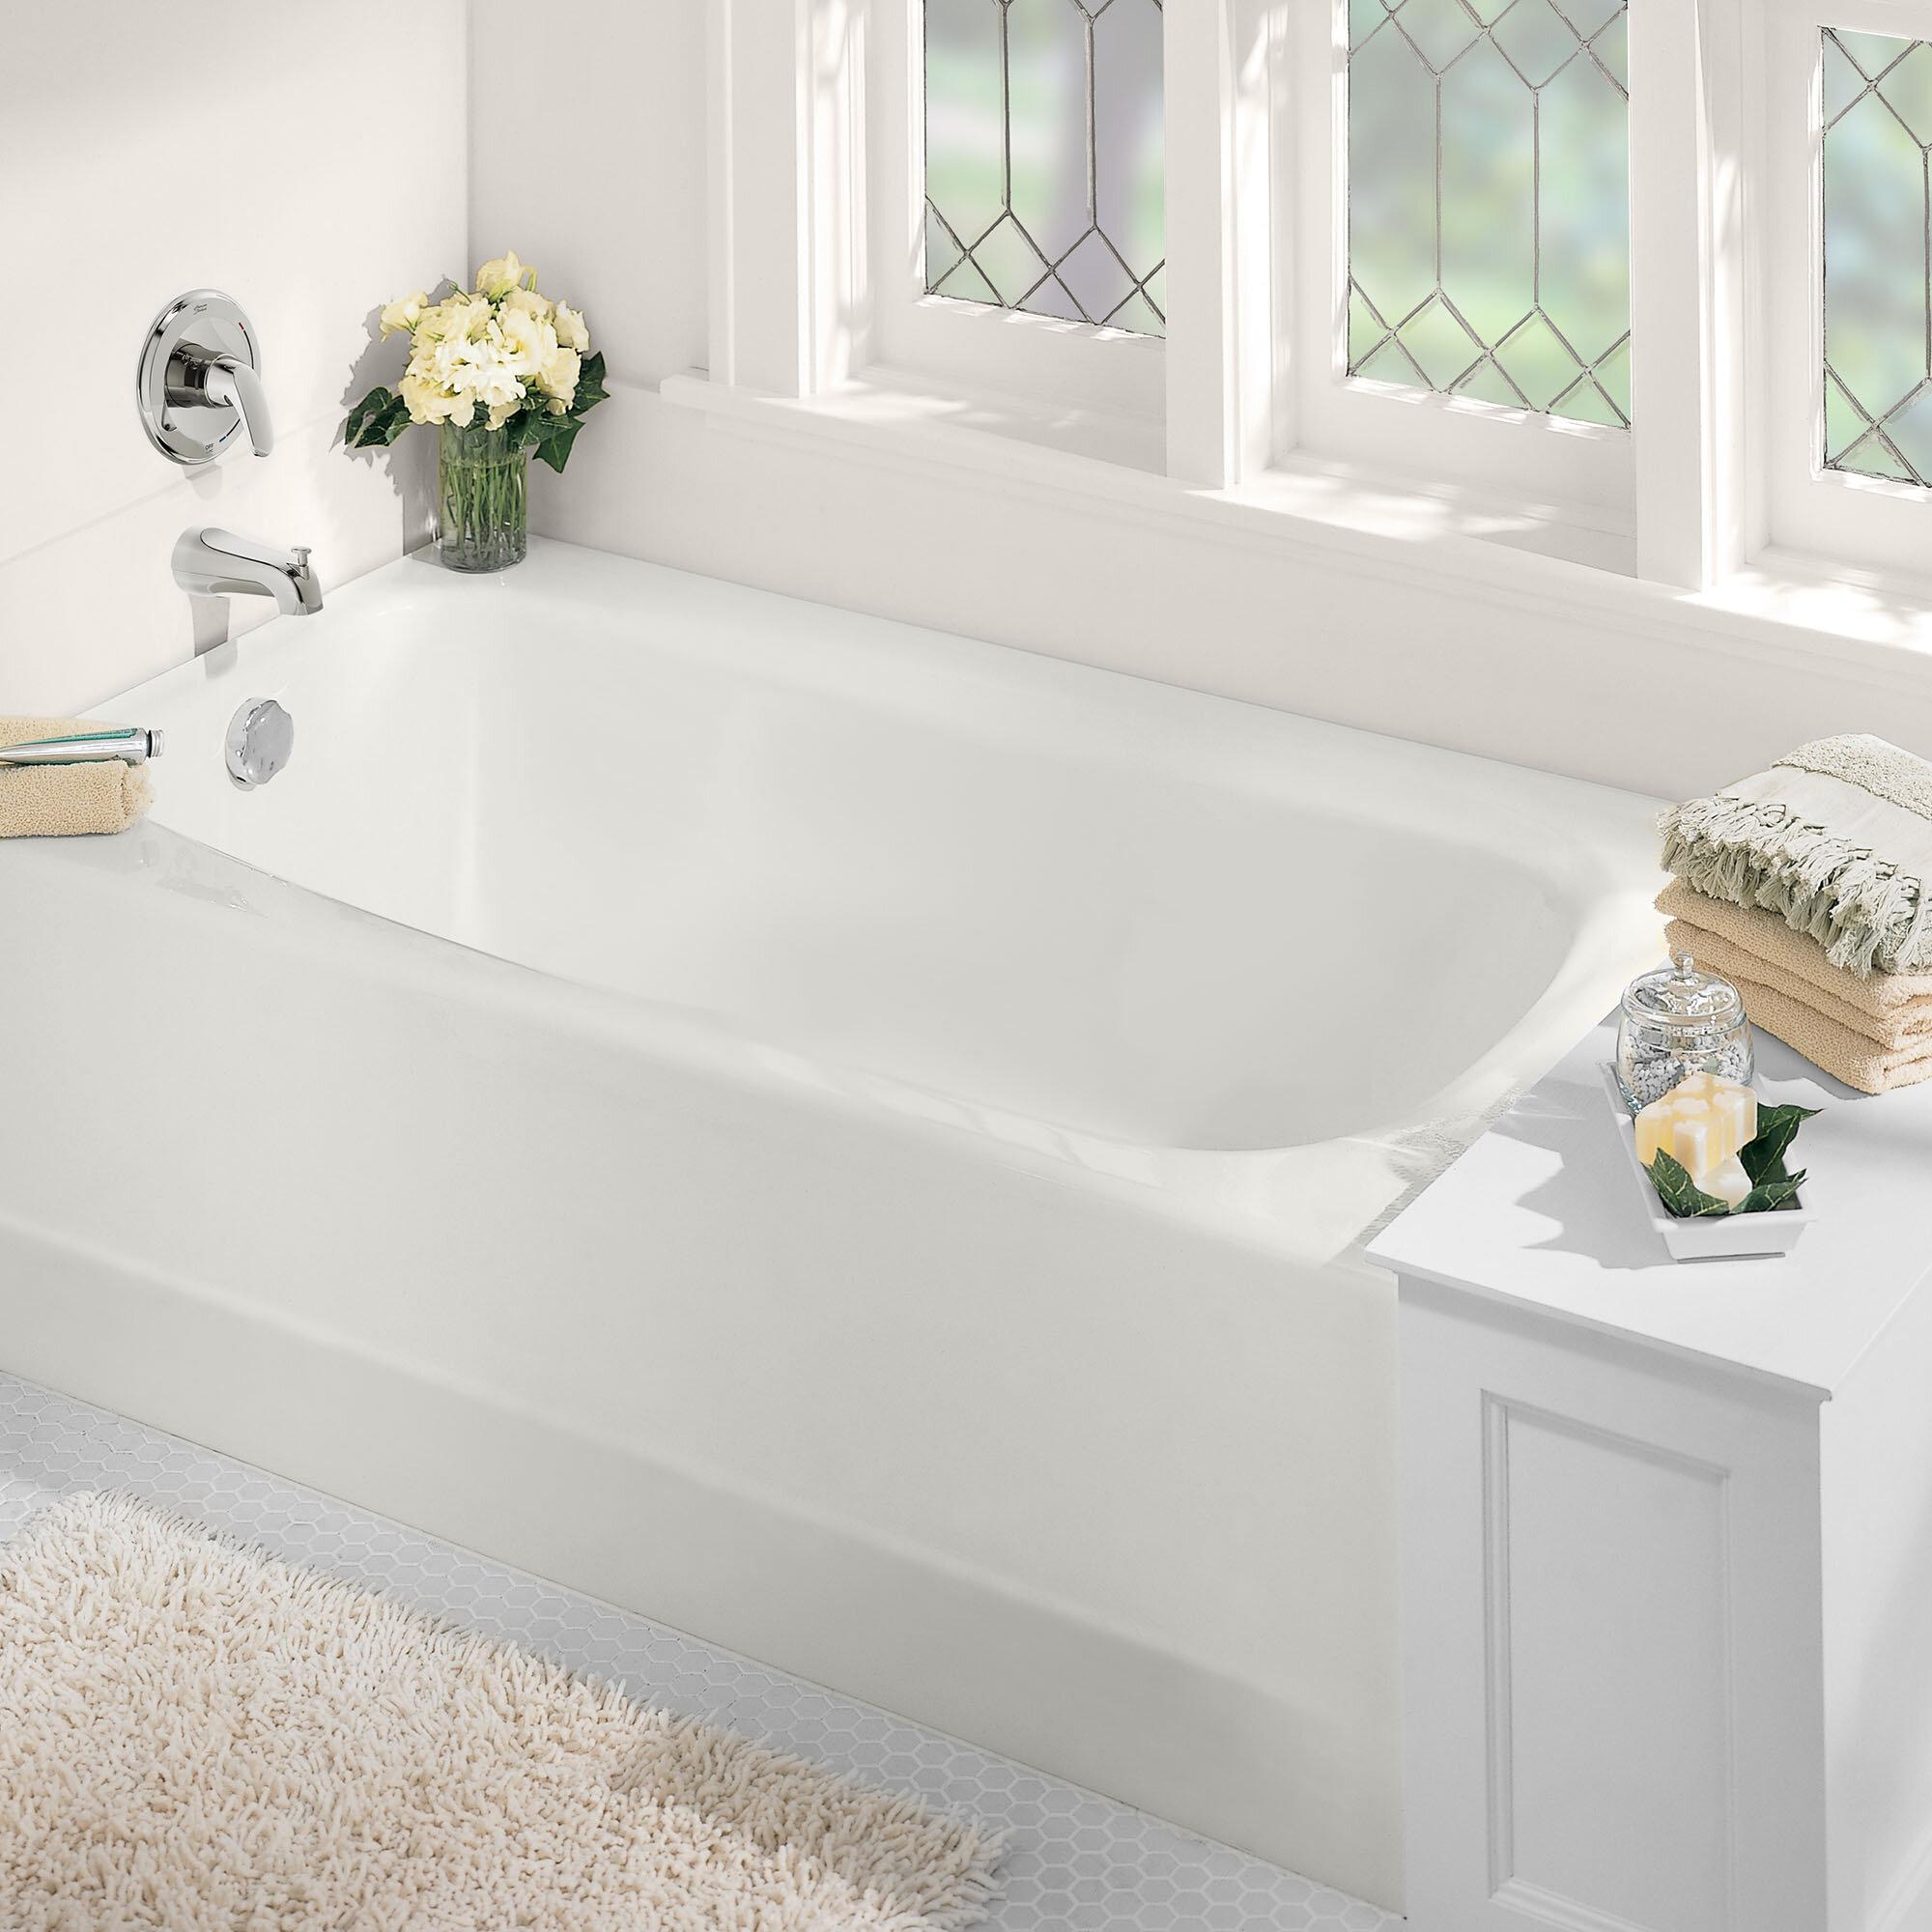 American Standard Cambridge 60 X 32 Alcove Soaking Americast Bathtub Reviews